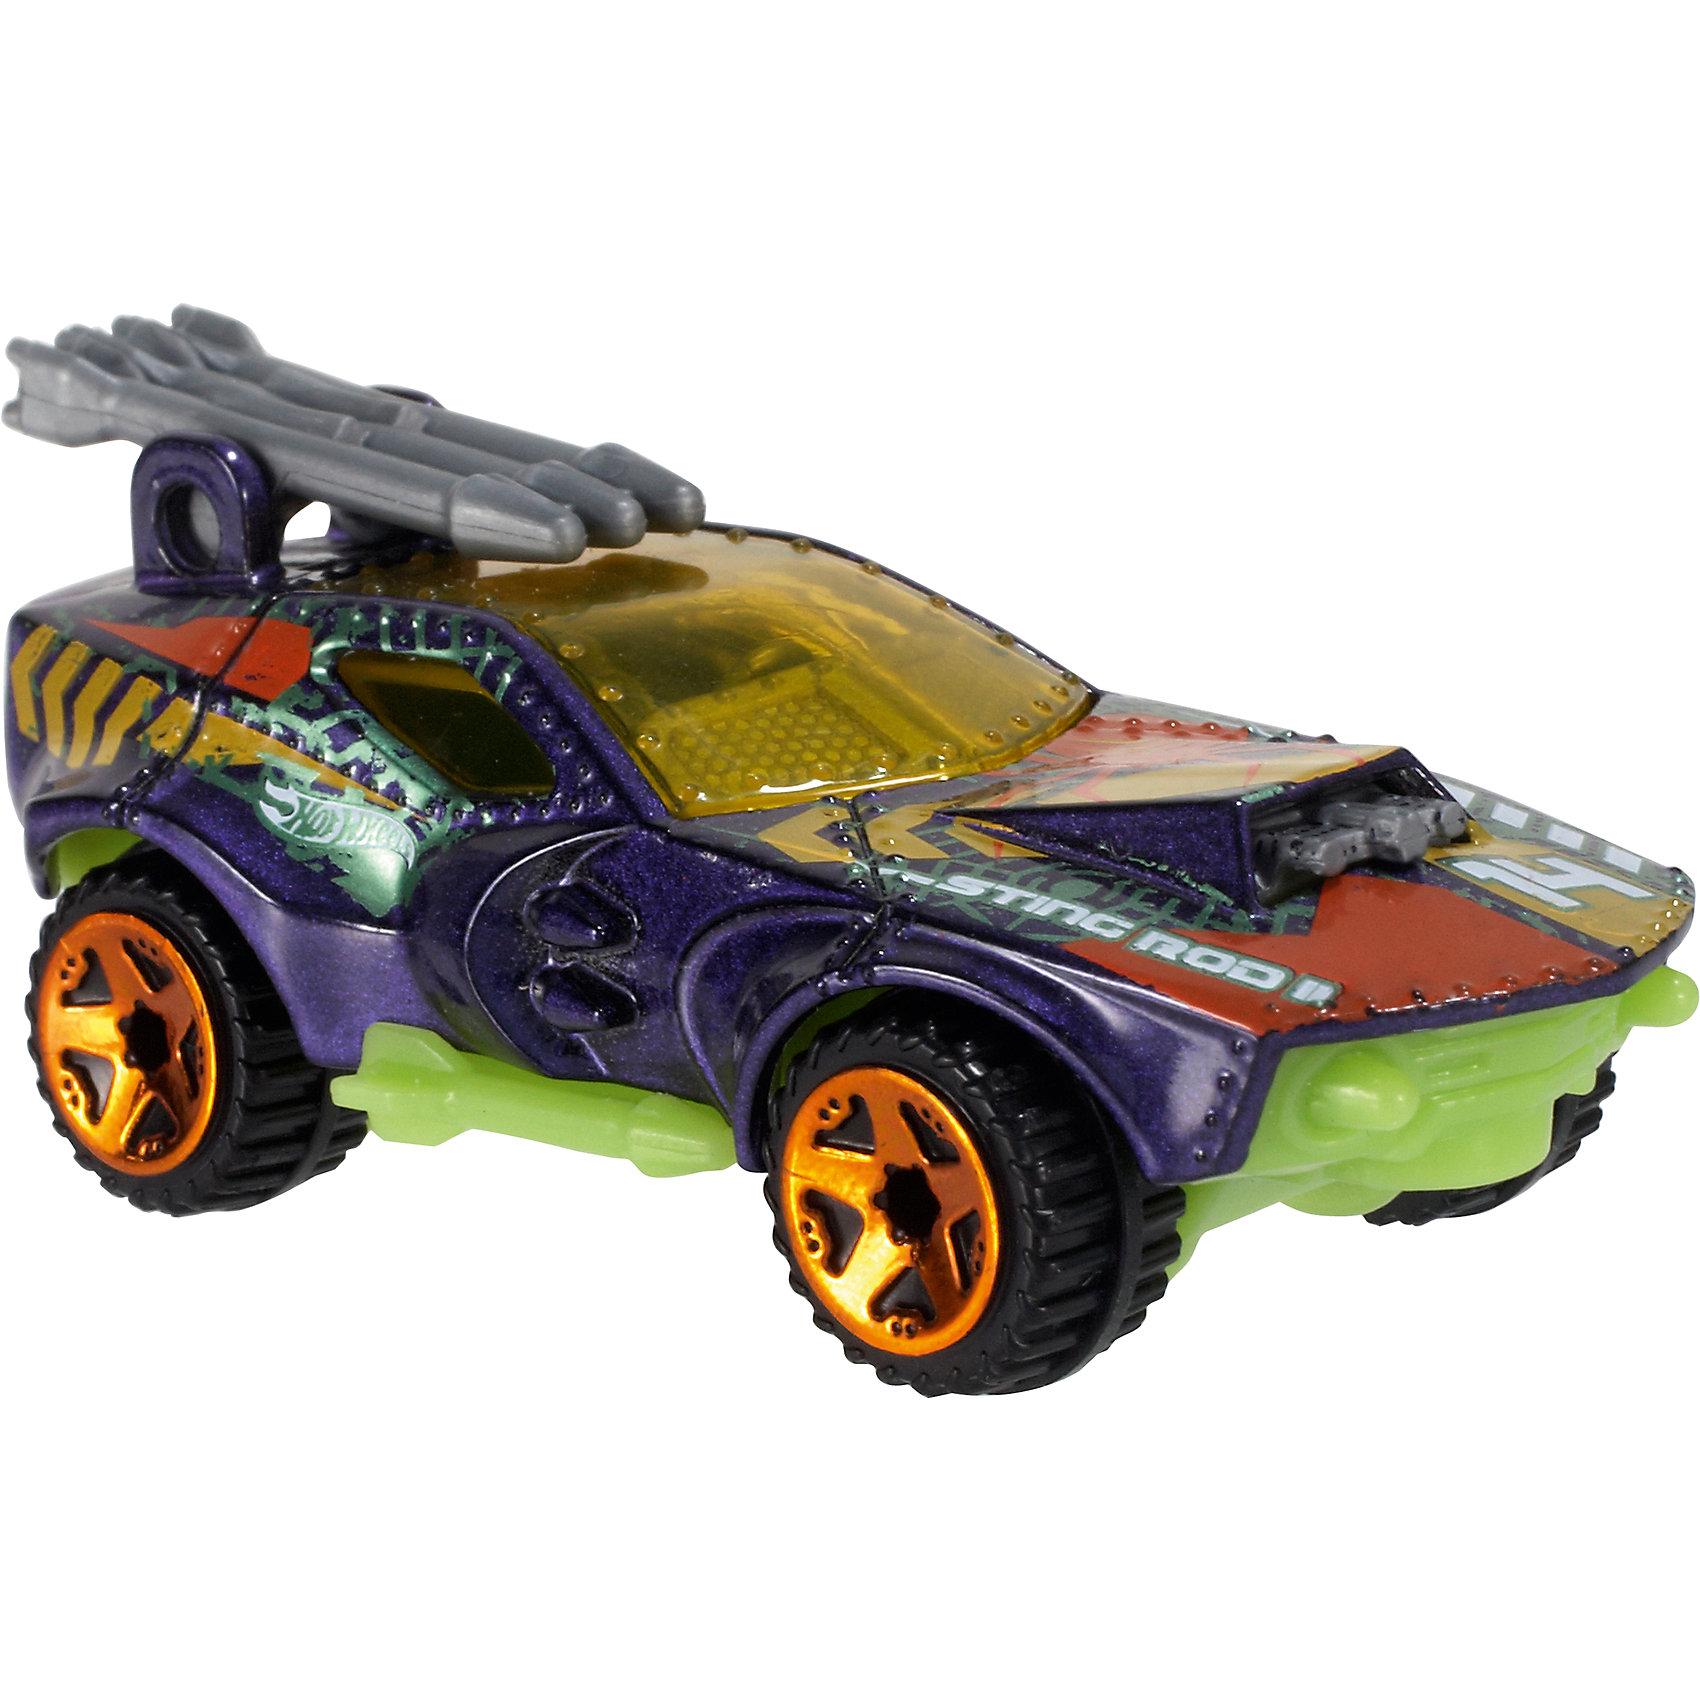 Базовая машинка Hot Wheels, Sting Rod IIМашинки<br><br><br>Ширина мм: 110<br>Глубина мм: 45<br>Высота мм: 110<br>Вес г: 30<br>Возраст от месяцев: 36<br>Возраст до месяцев: 96<br>Пол: Мужской<br>Возраст: Детский<br>SKU: 7111918